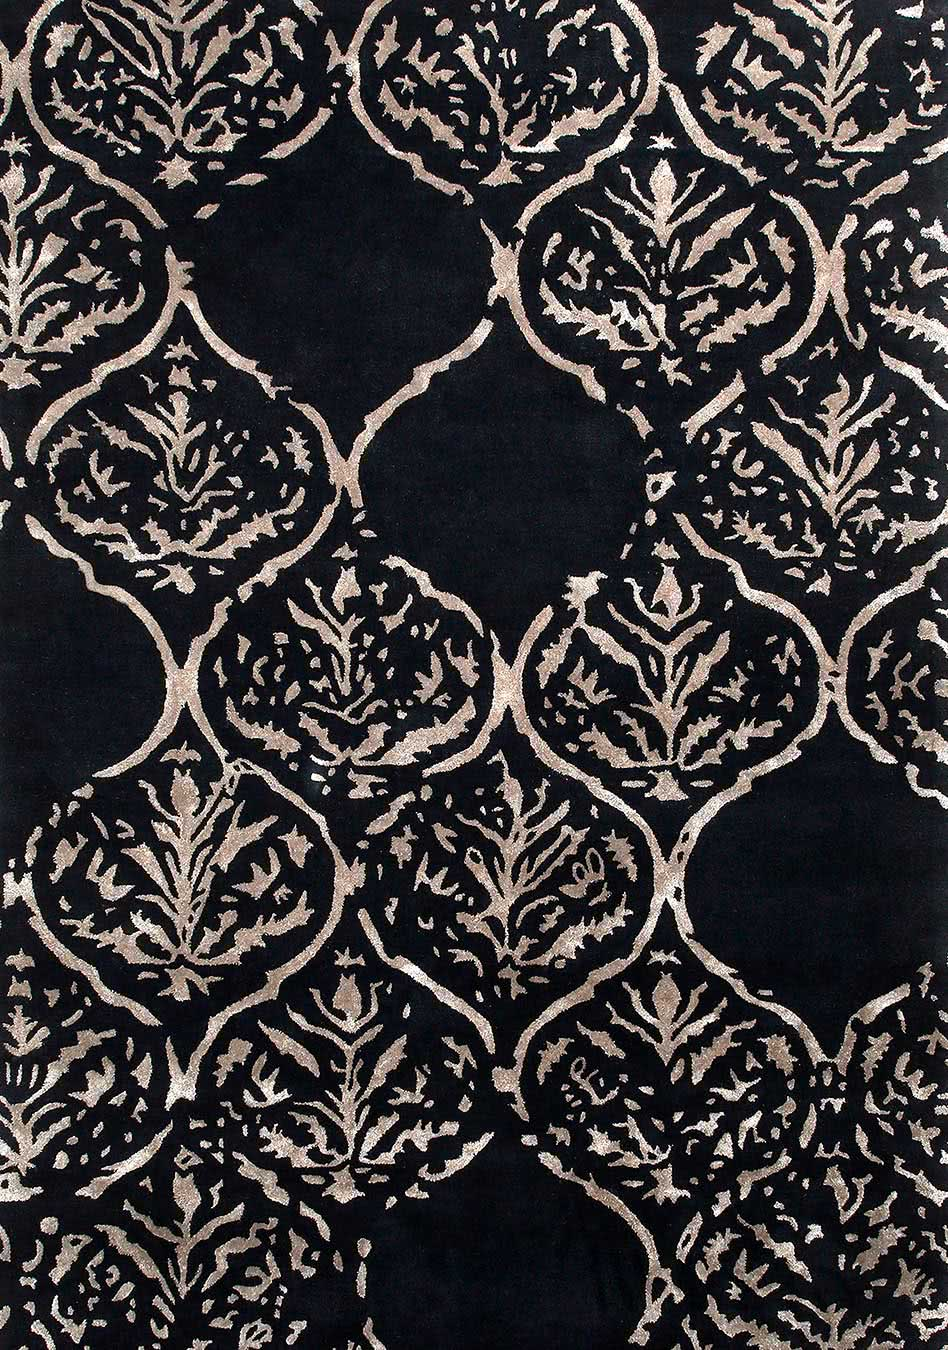 Othello rug in dark navy colourway overhead image